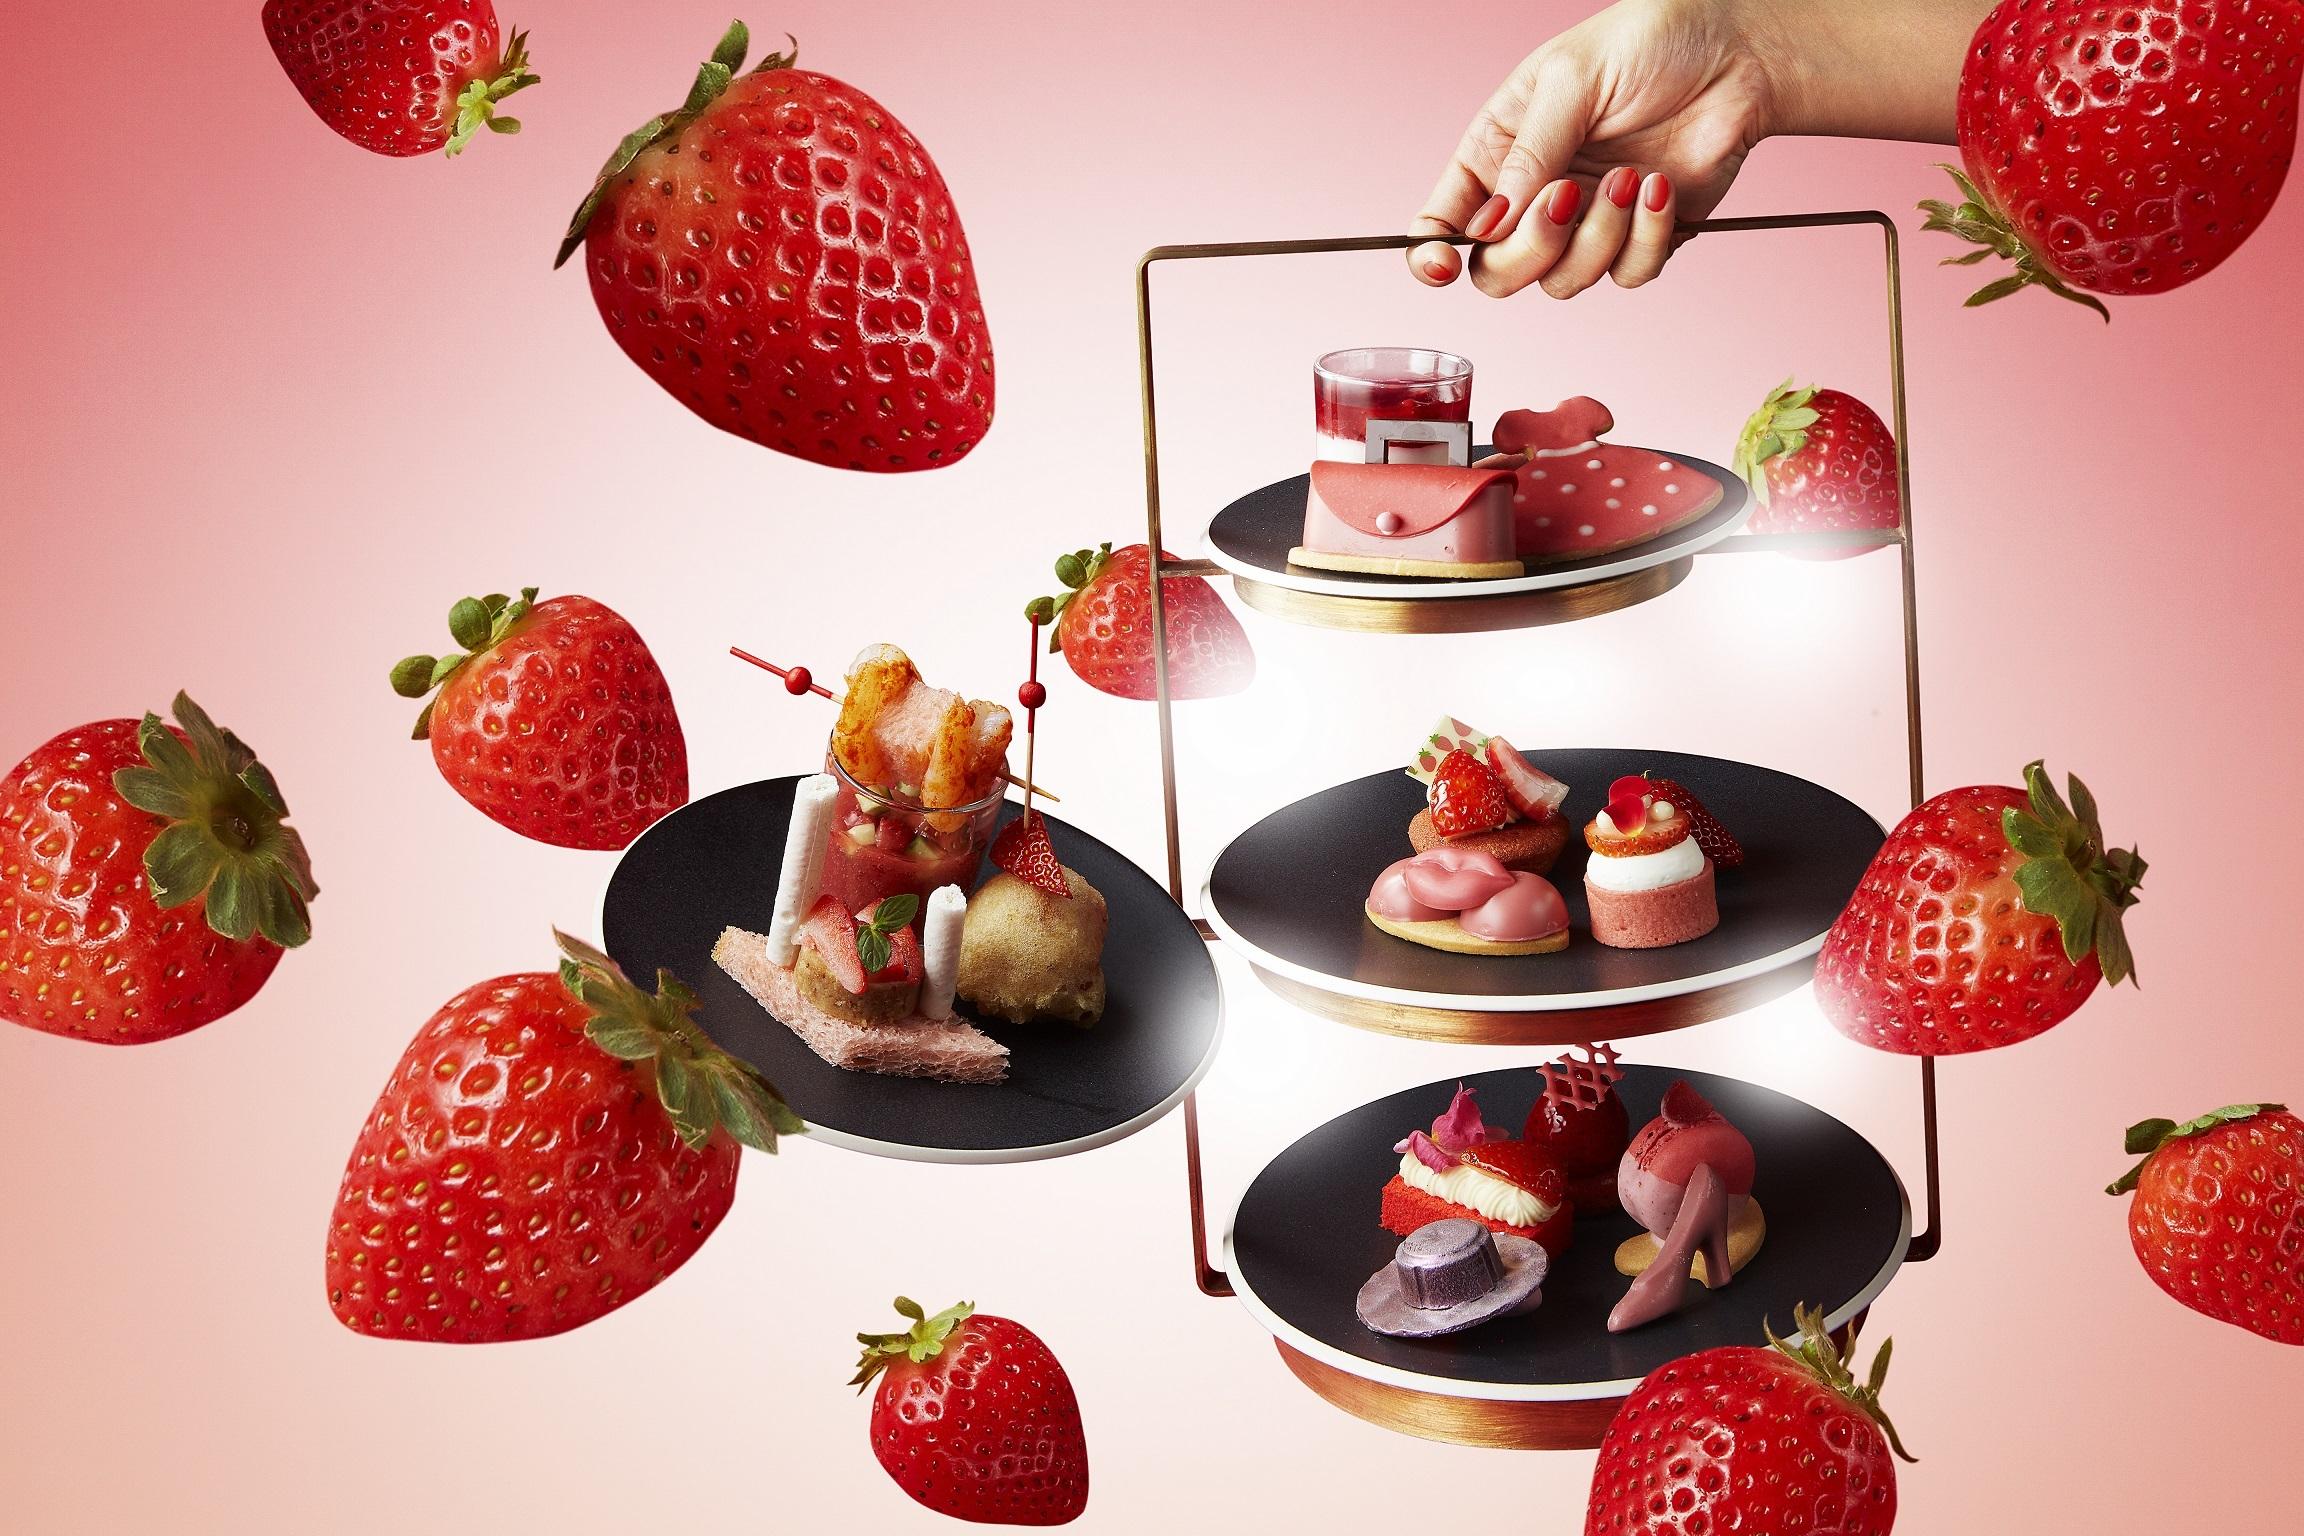 ANA InterContinental Tokyo Strawberry Afternoon Tea Set